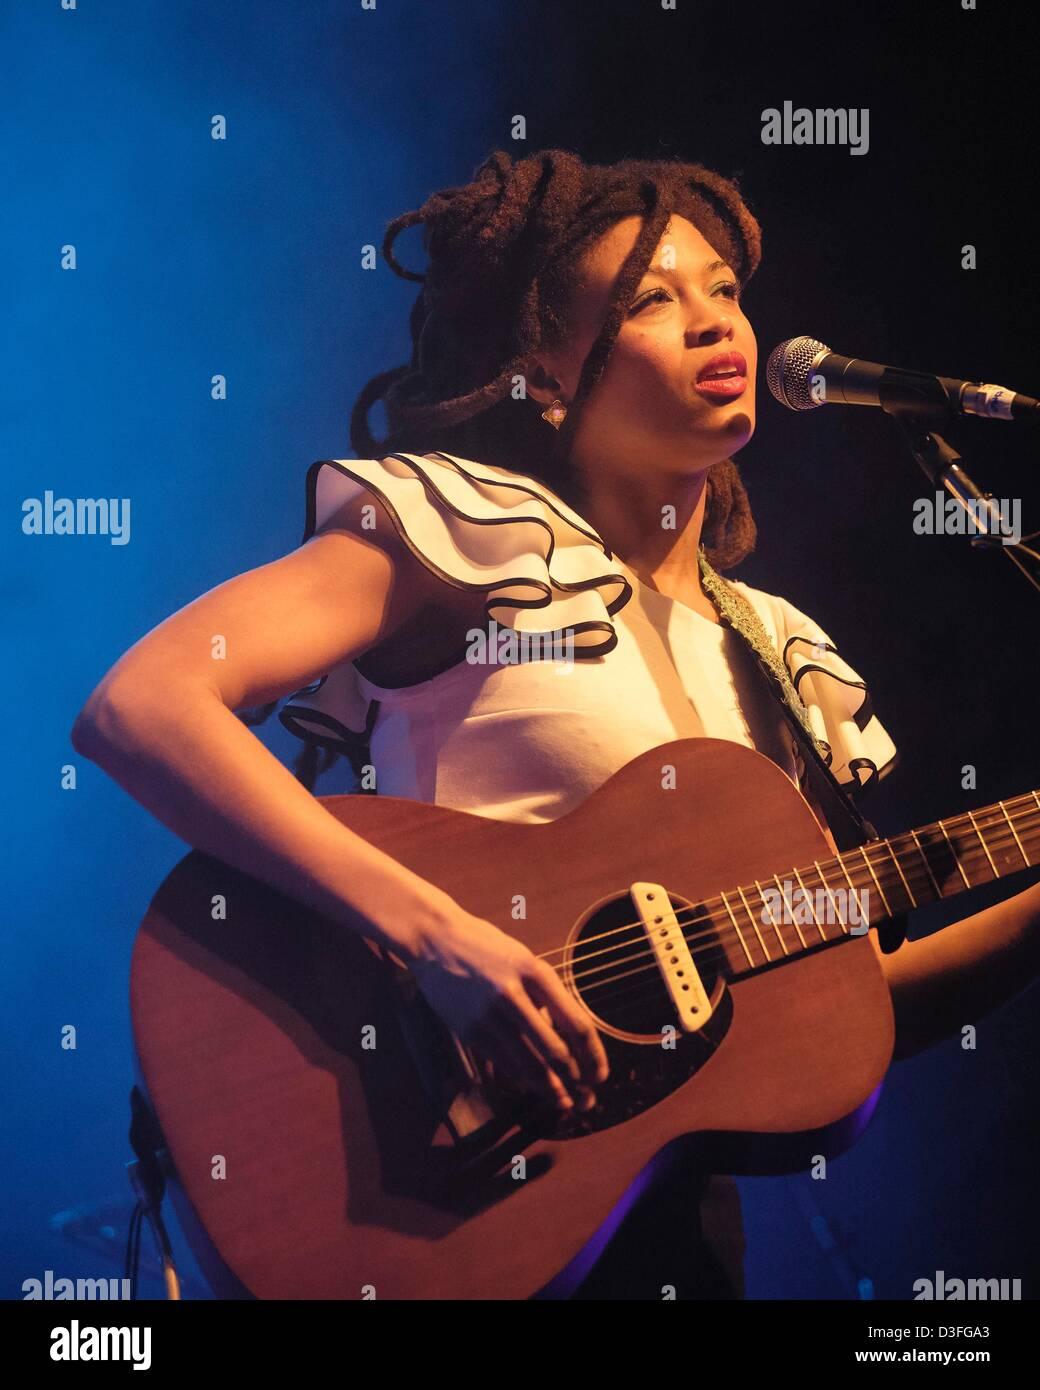 Brighton, UK. 18th February 2013. Valerie June, American singer, songwriter, and multi-instrumentalist plays Brighton - Stock Image